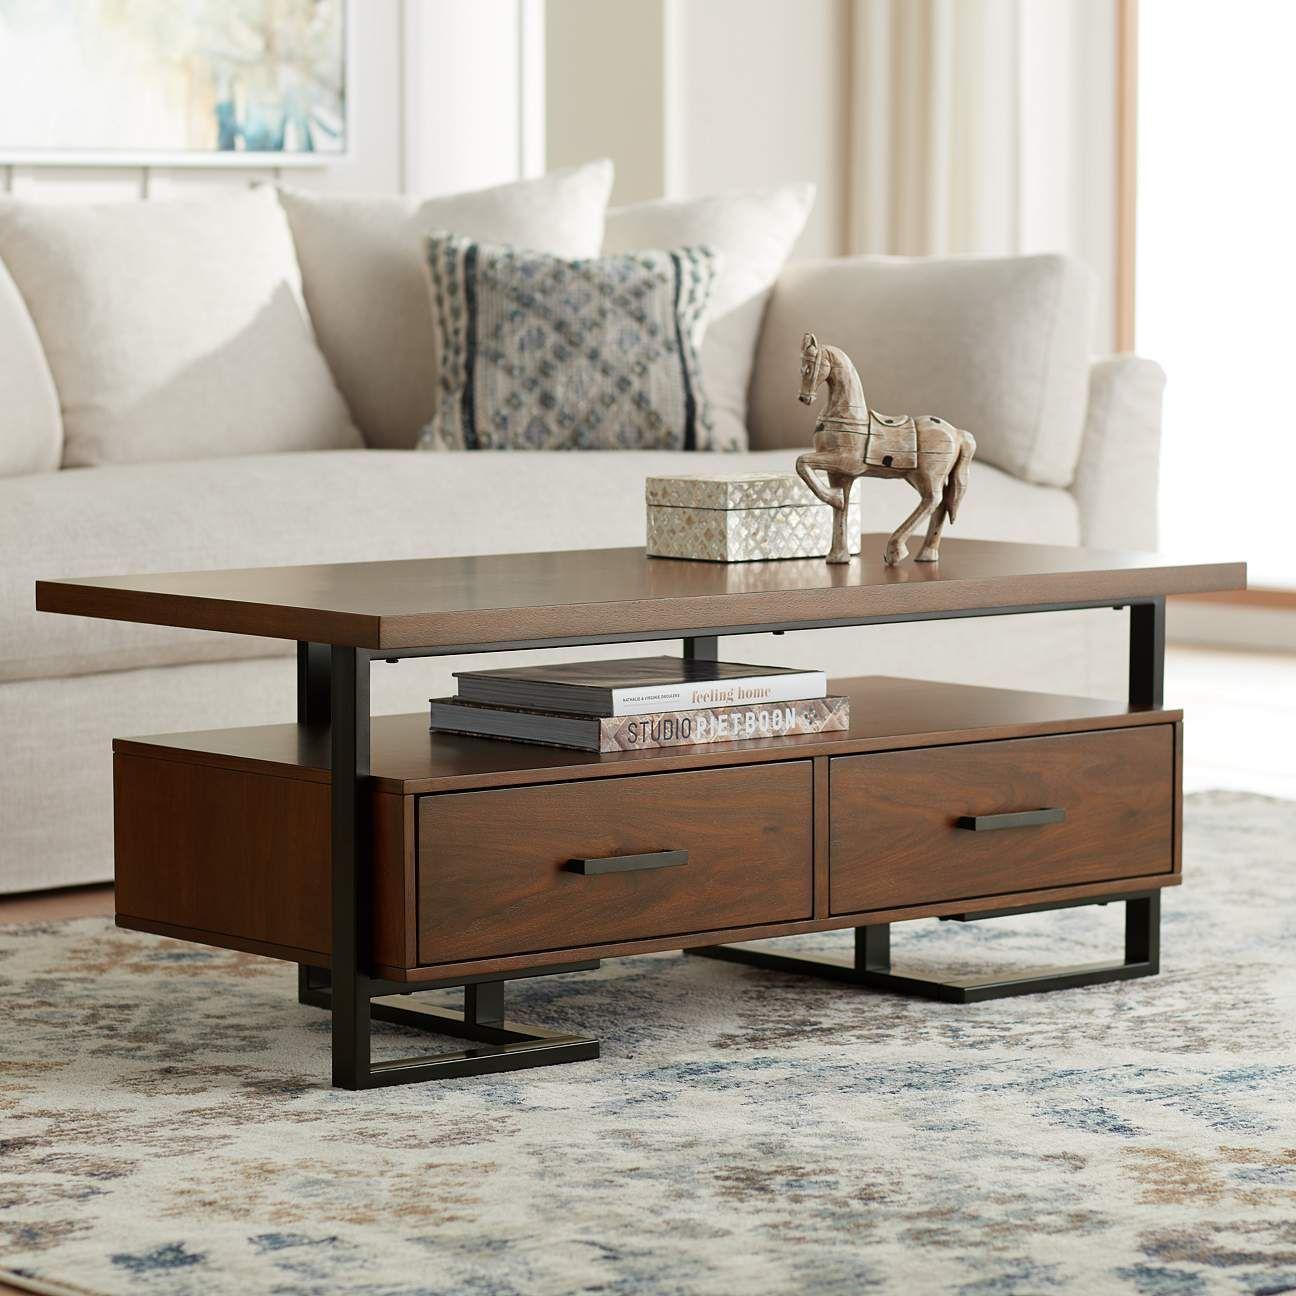 Sedley 48 Wide Walnut Veneer 2 Drawer Modern Coffee Table 46m35 Lamps Plus In 2021 Coffee Table Modern Coffee Tables Modern Wood Coffee Table [ 1296 x 1296 Pixel ]